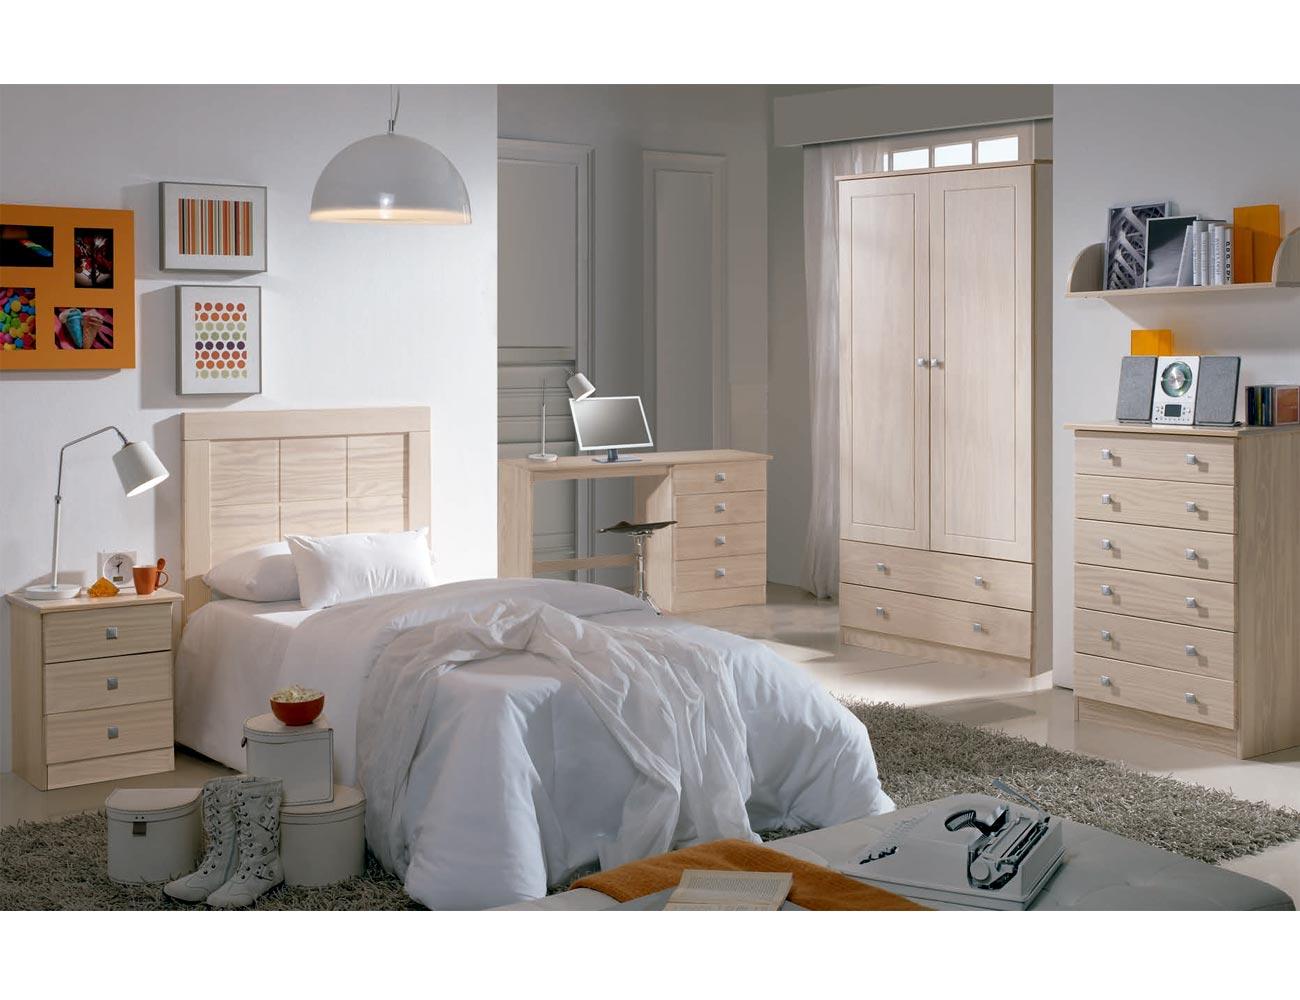 Dormitorio juvenil madera decape